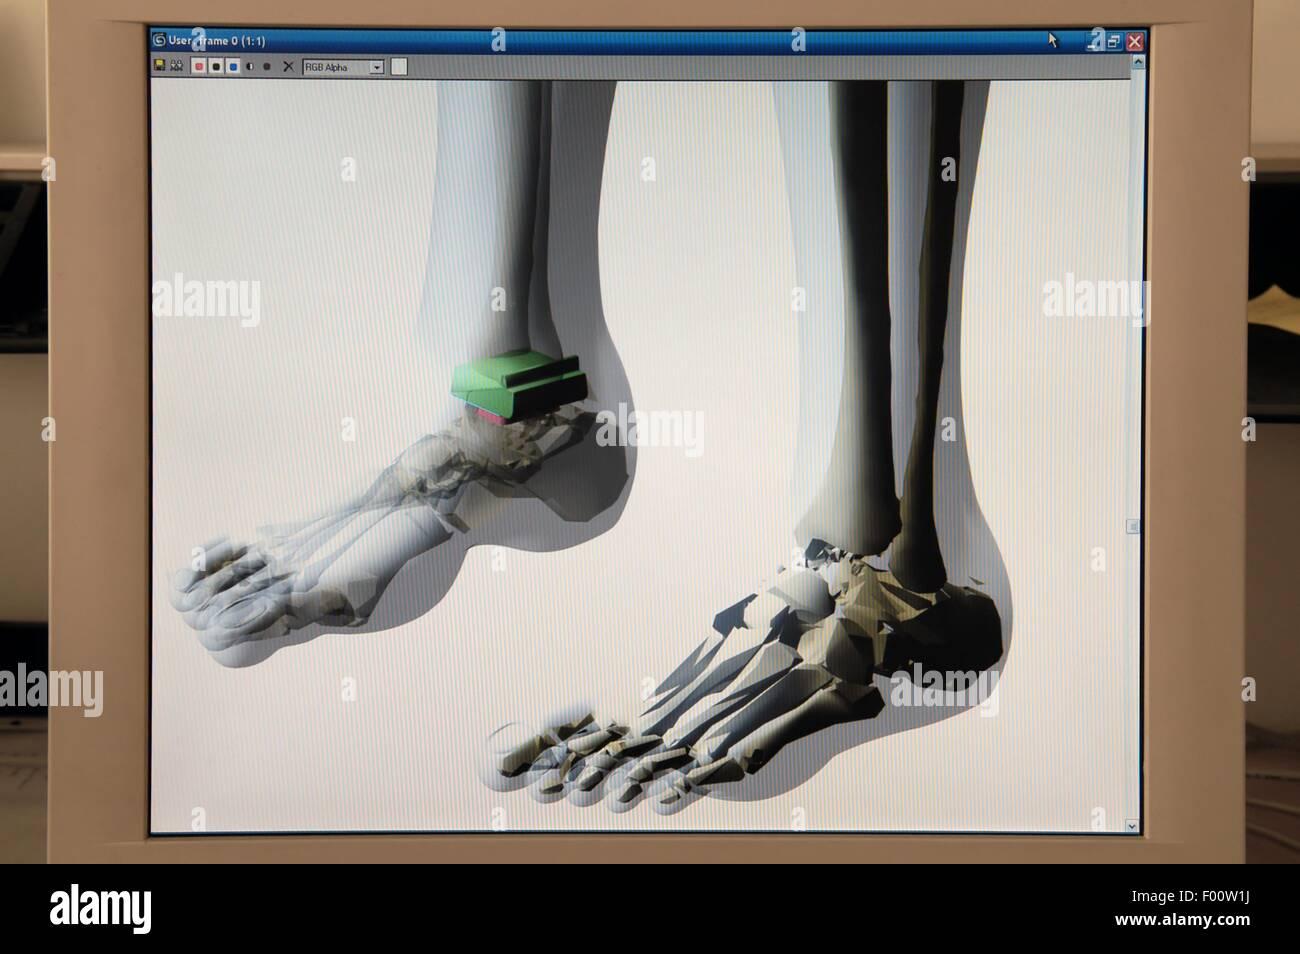 Feet Radiography Stockfotos & Feet Radiography Bilder - Alamy